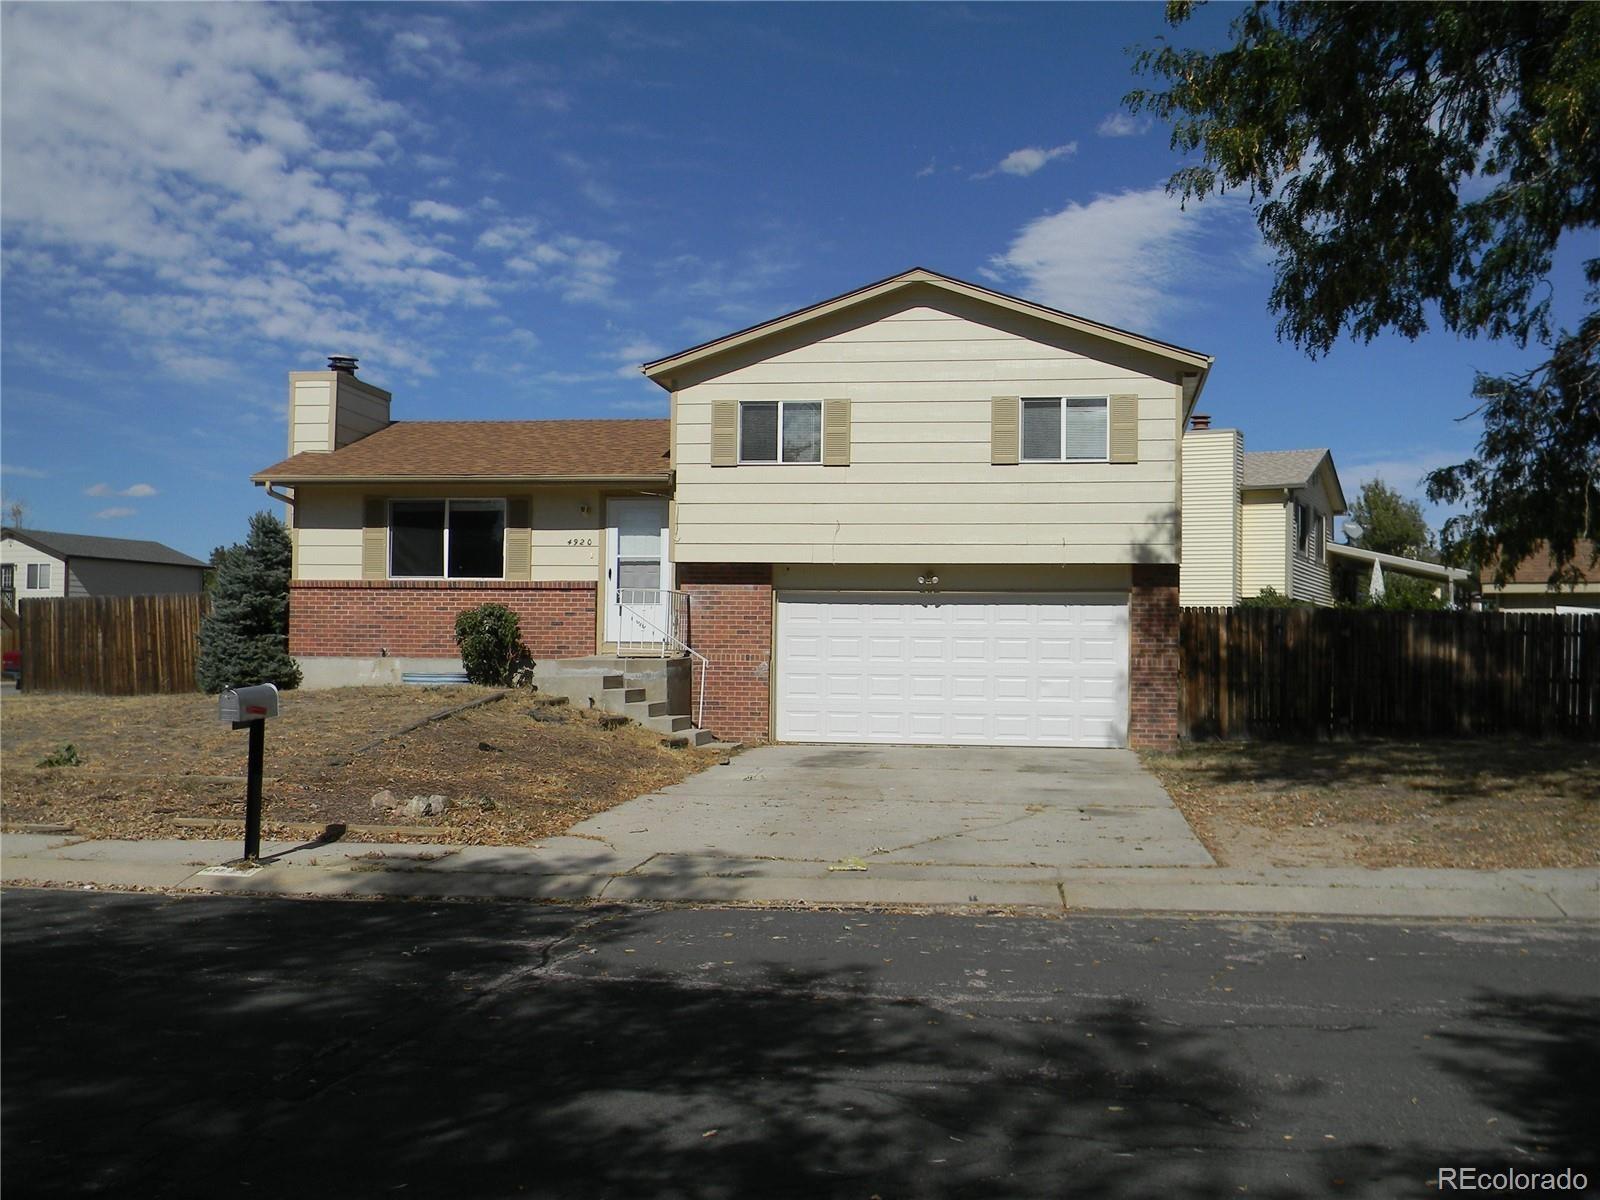 MLS# 5946356 - 1 - 4920 Ridenour Drive, Colorado Springs, CO 80916